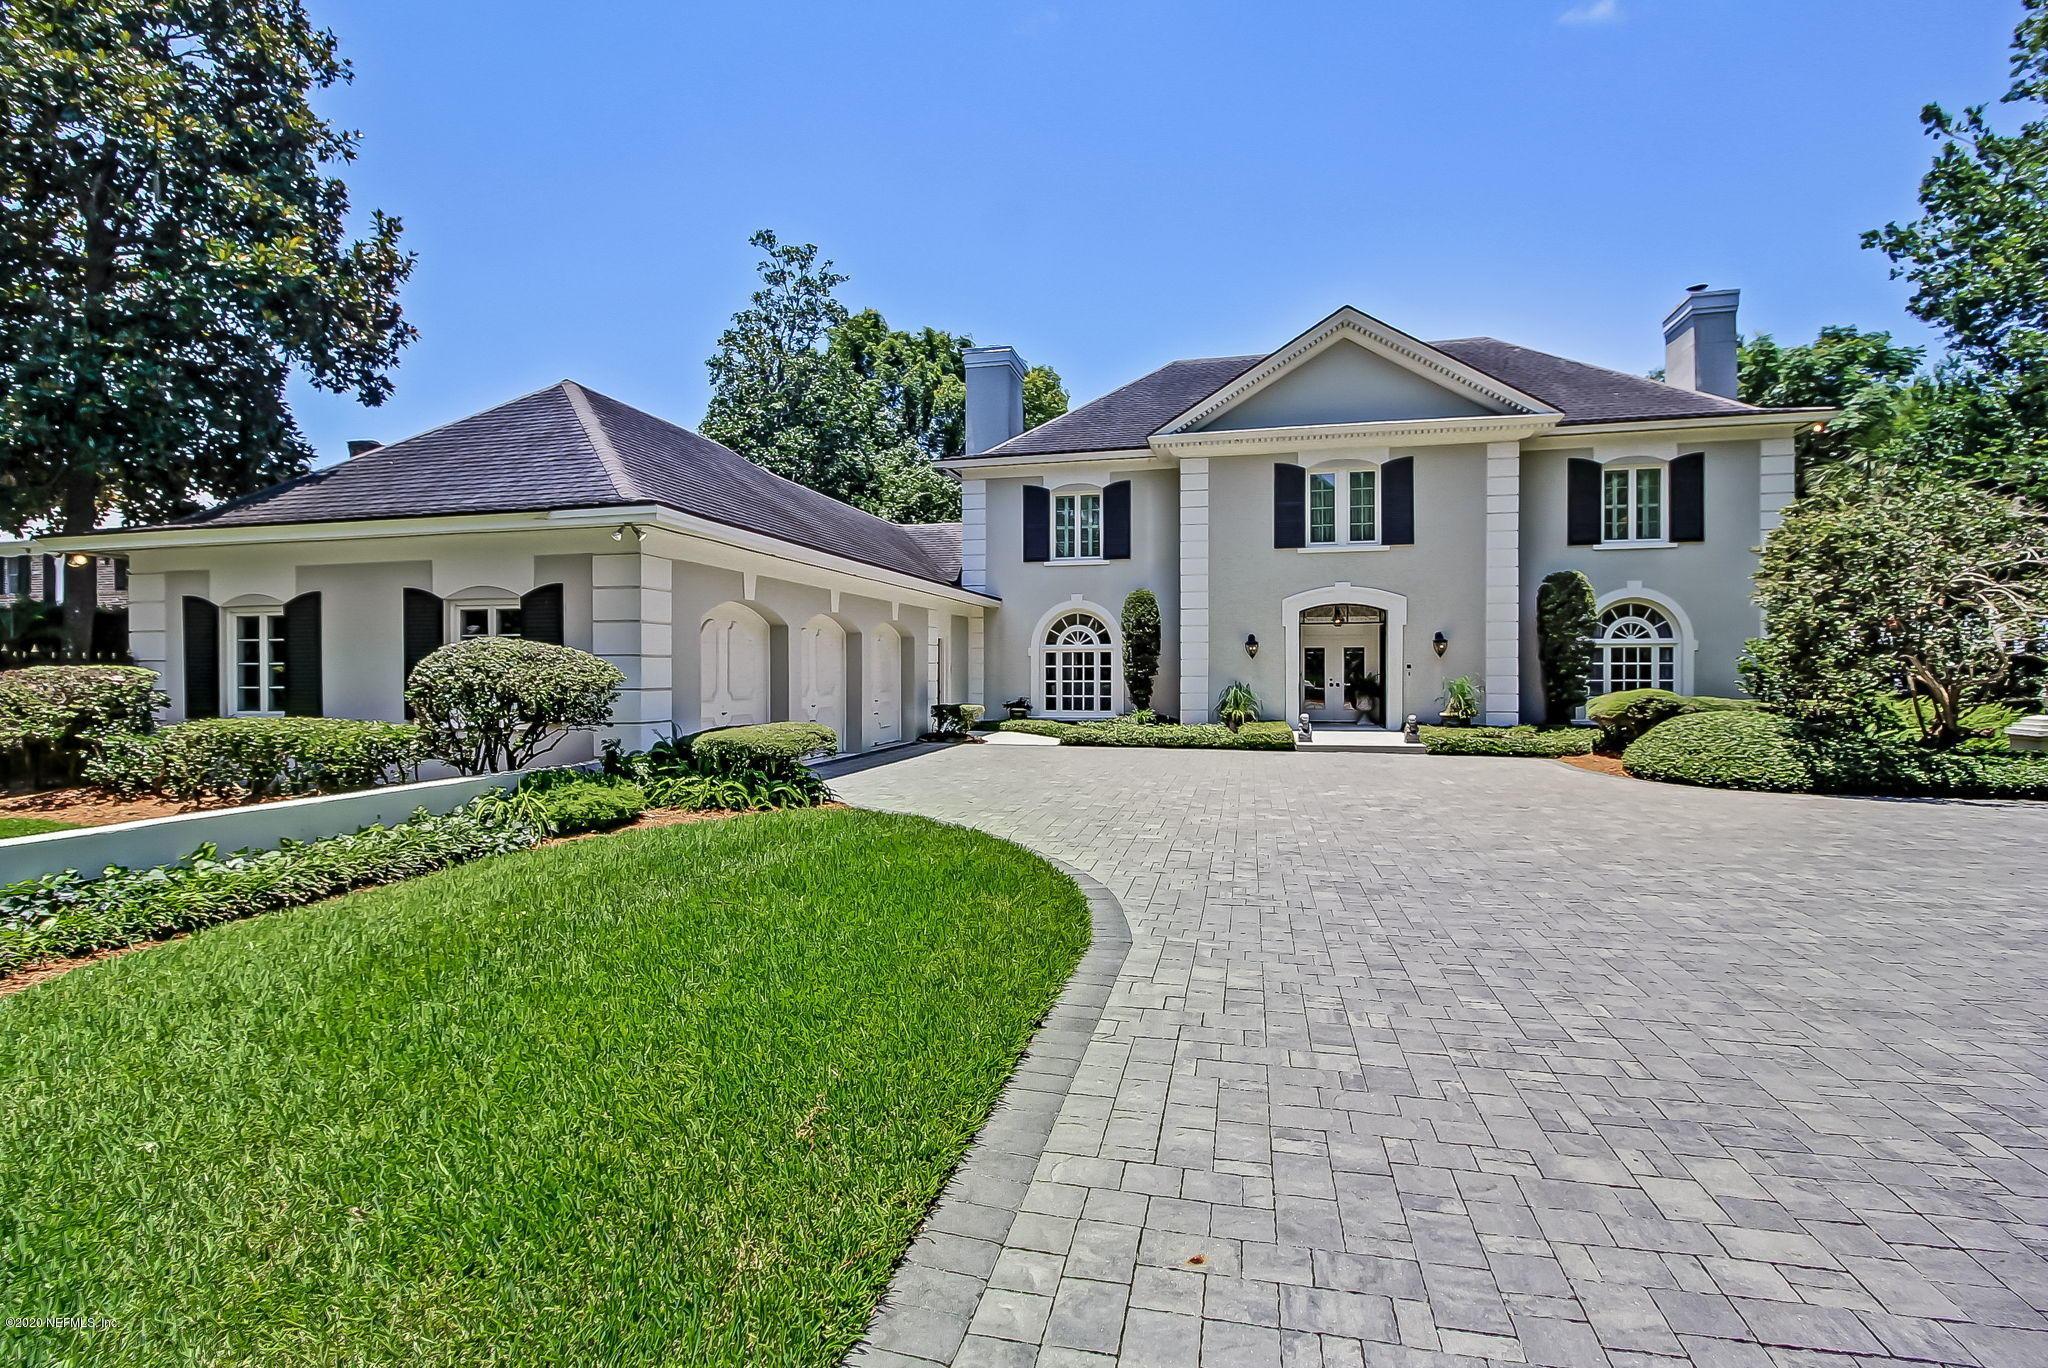 Details for 3520 Point Pleasant Rd, JACKSONVILLE, FL 32217